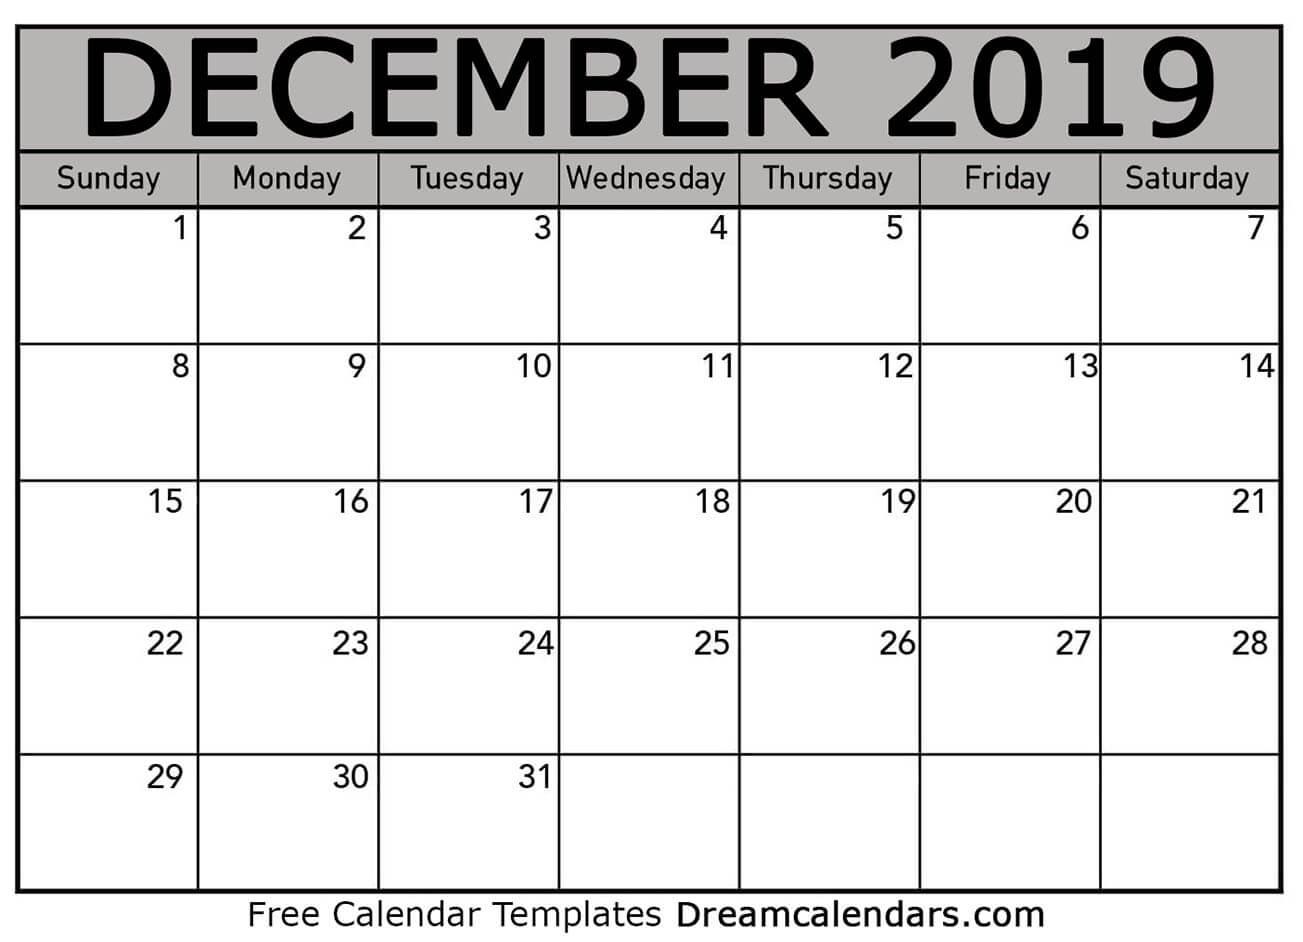 Free Blank December 2019 Printable Calendar